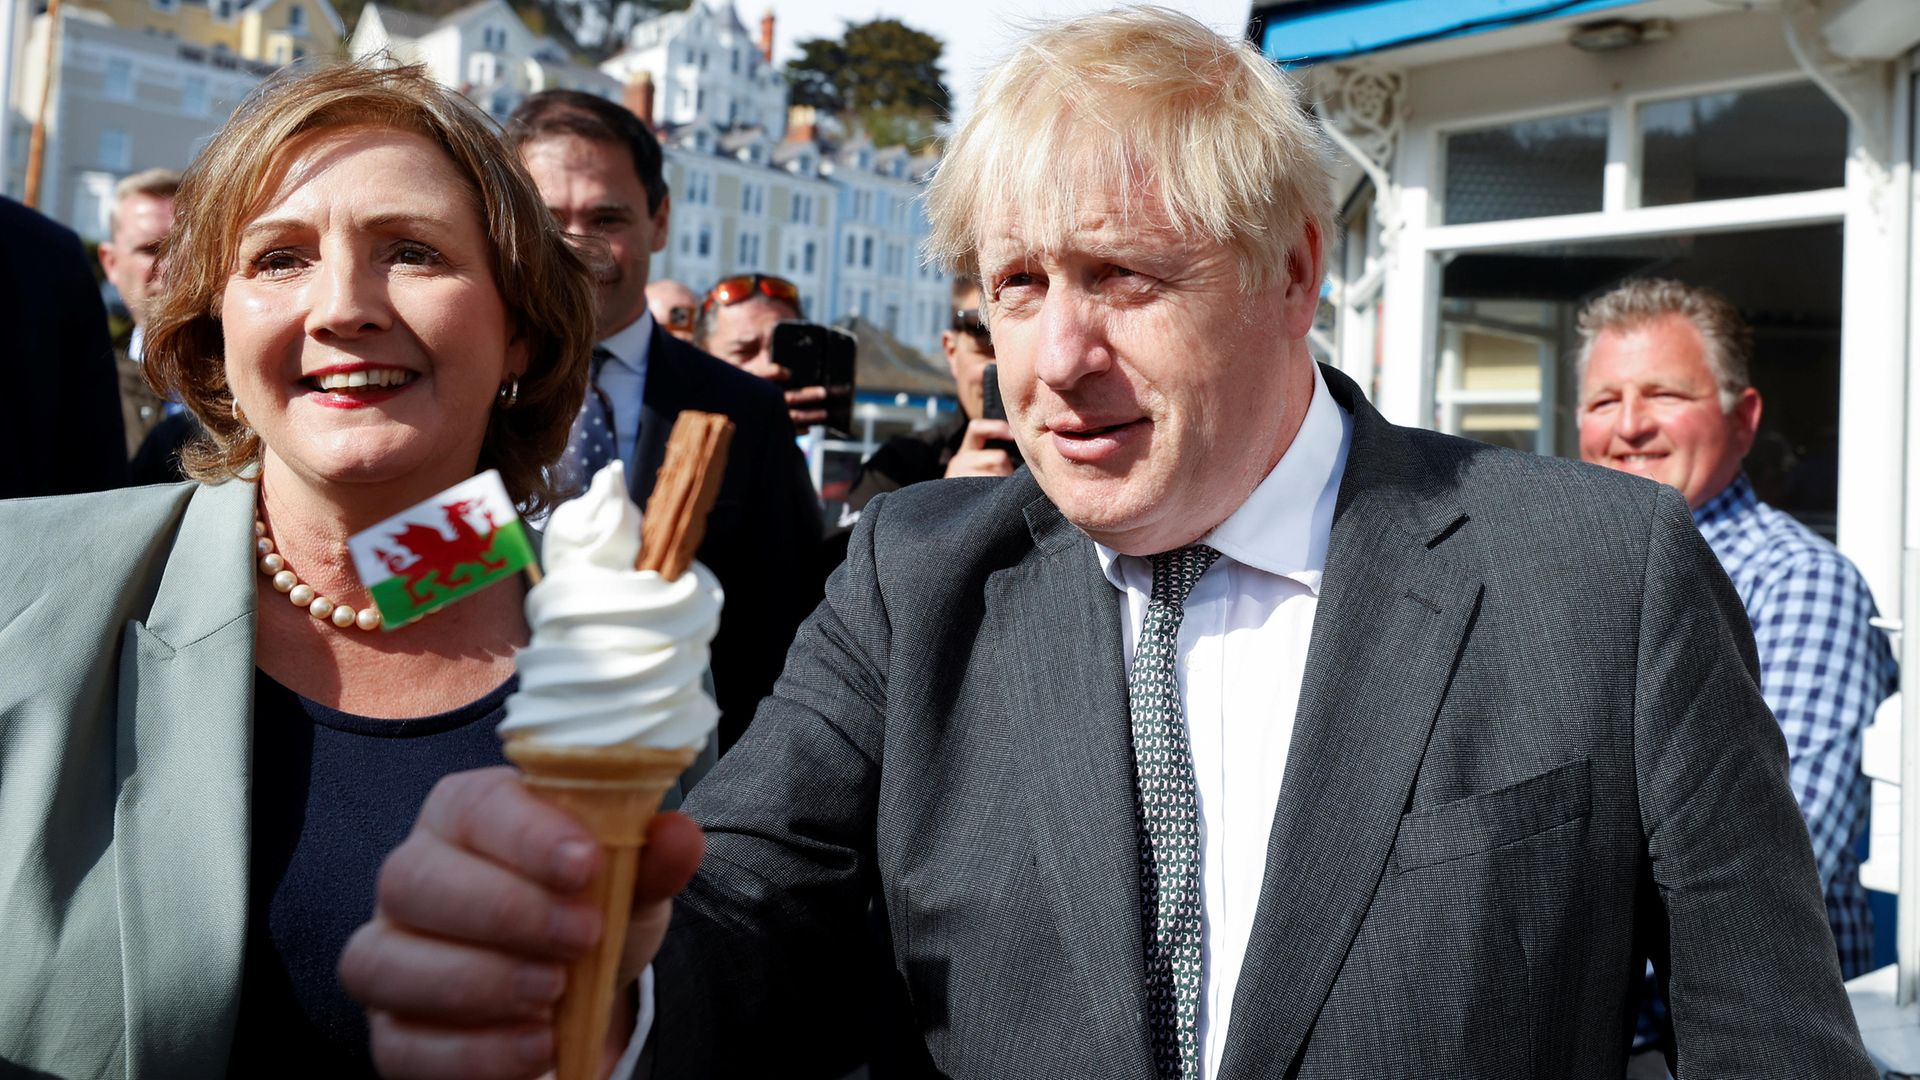 Six in 10 respondents said they regarded Boris Johnson as 'untrustworthy' - Credit: PA